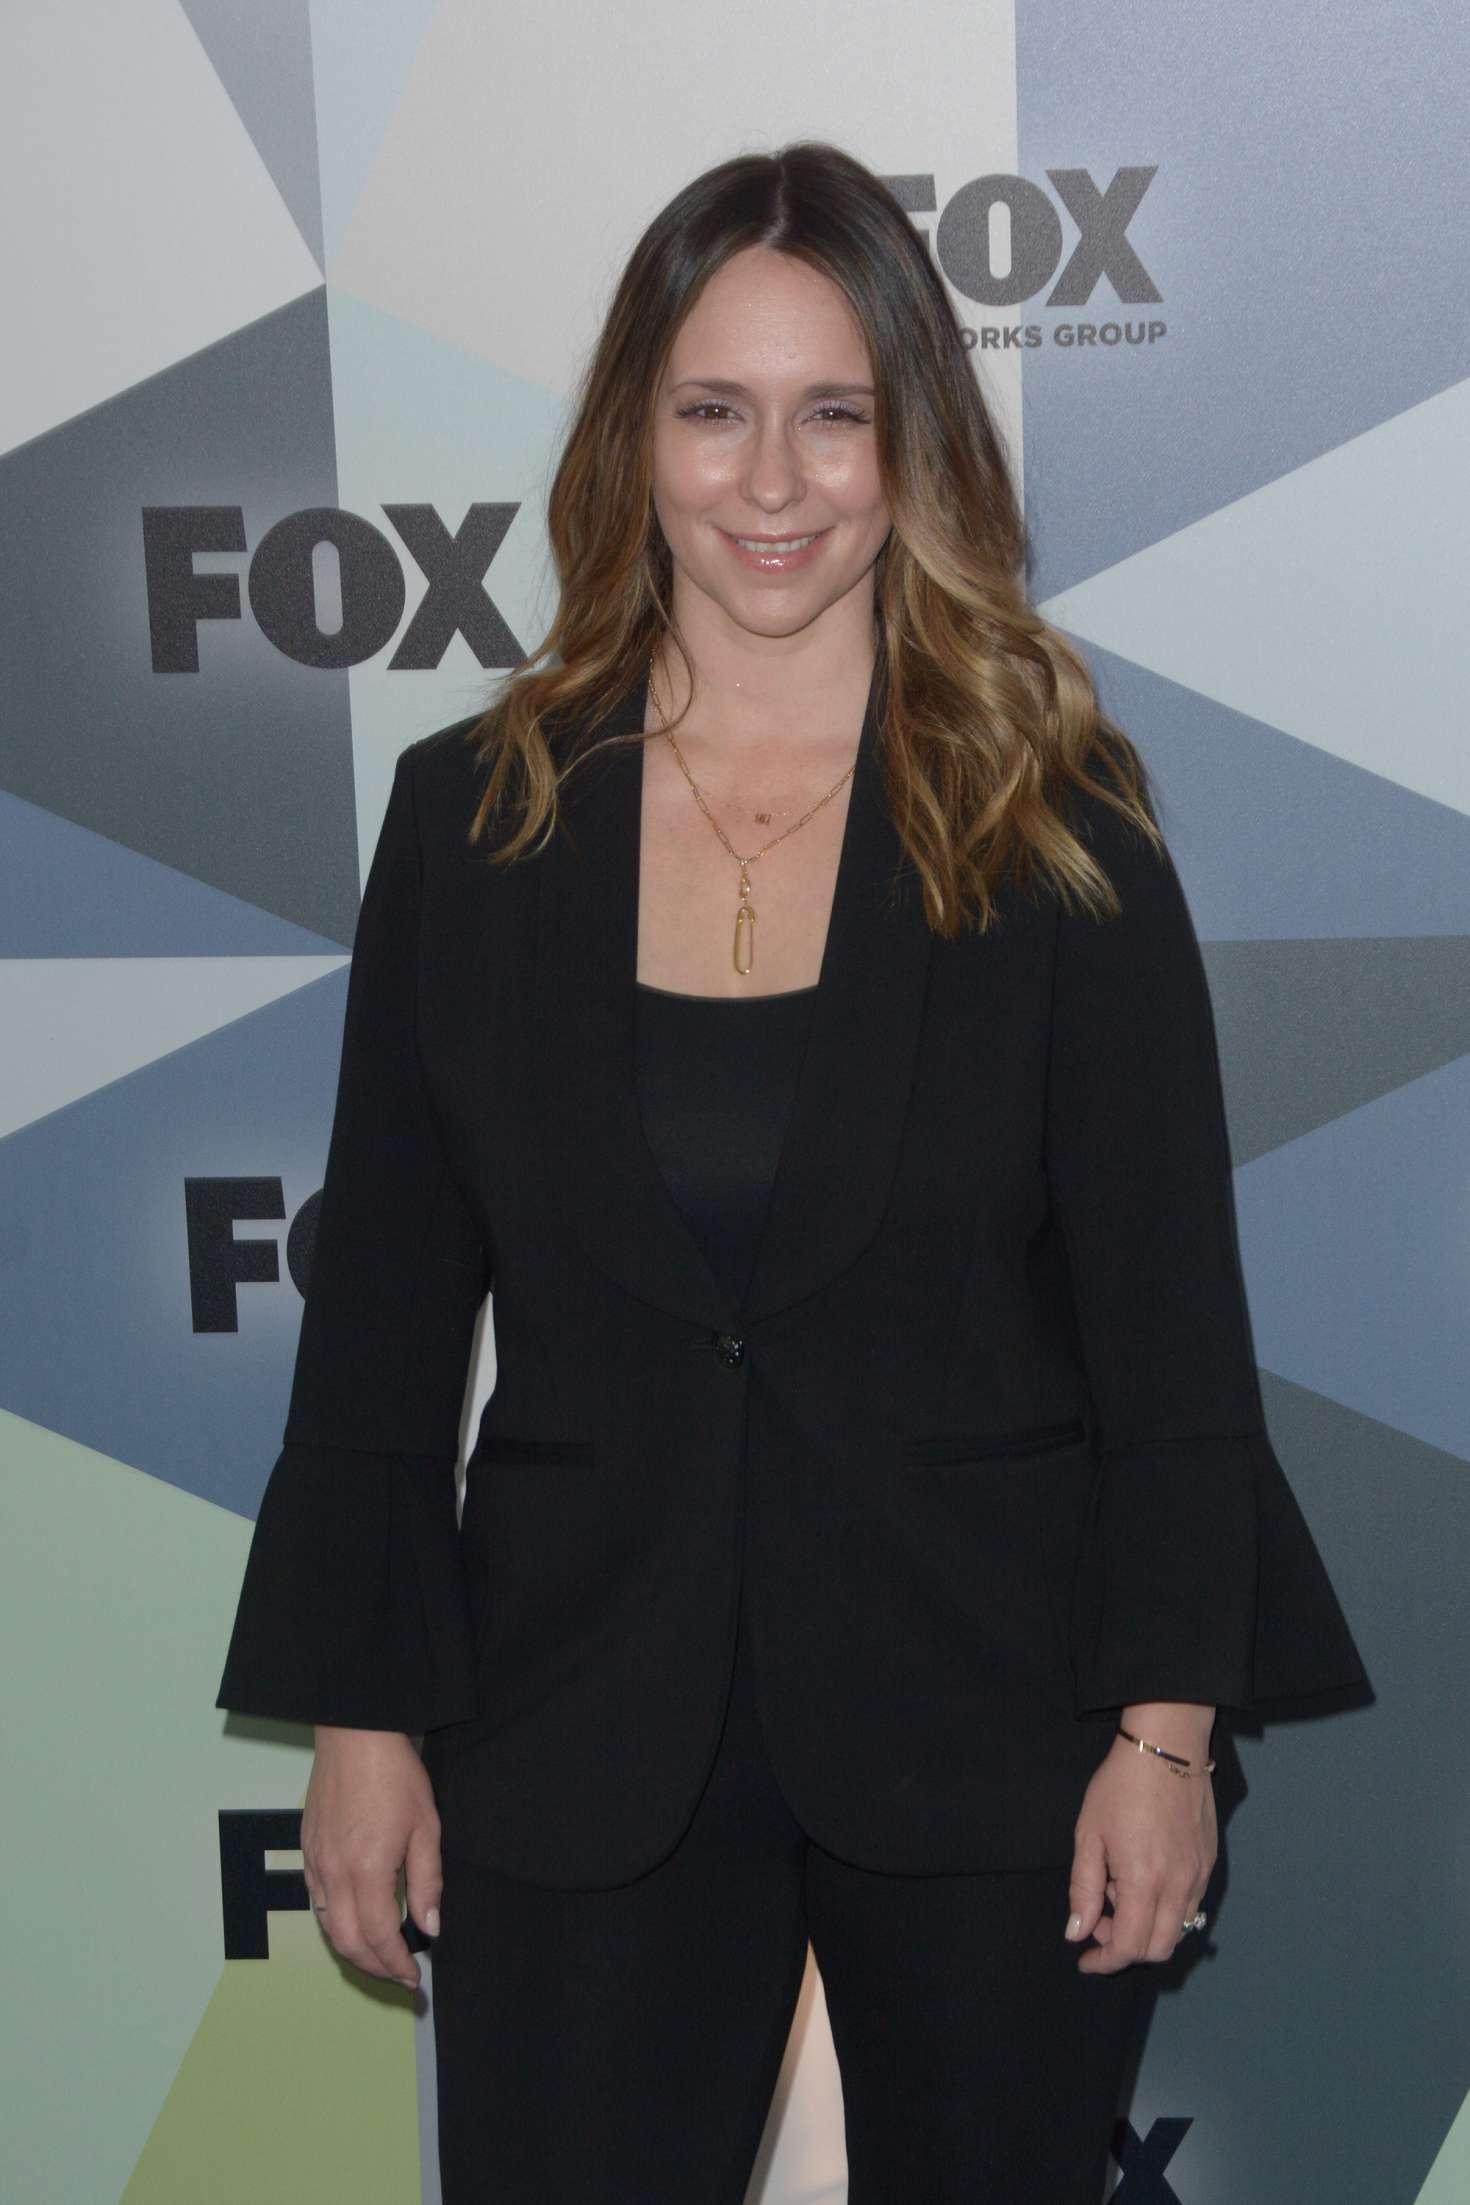 Jennifer Love Hewitt - 2018 Fox Network Upfront in NYC